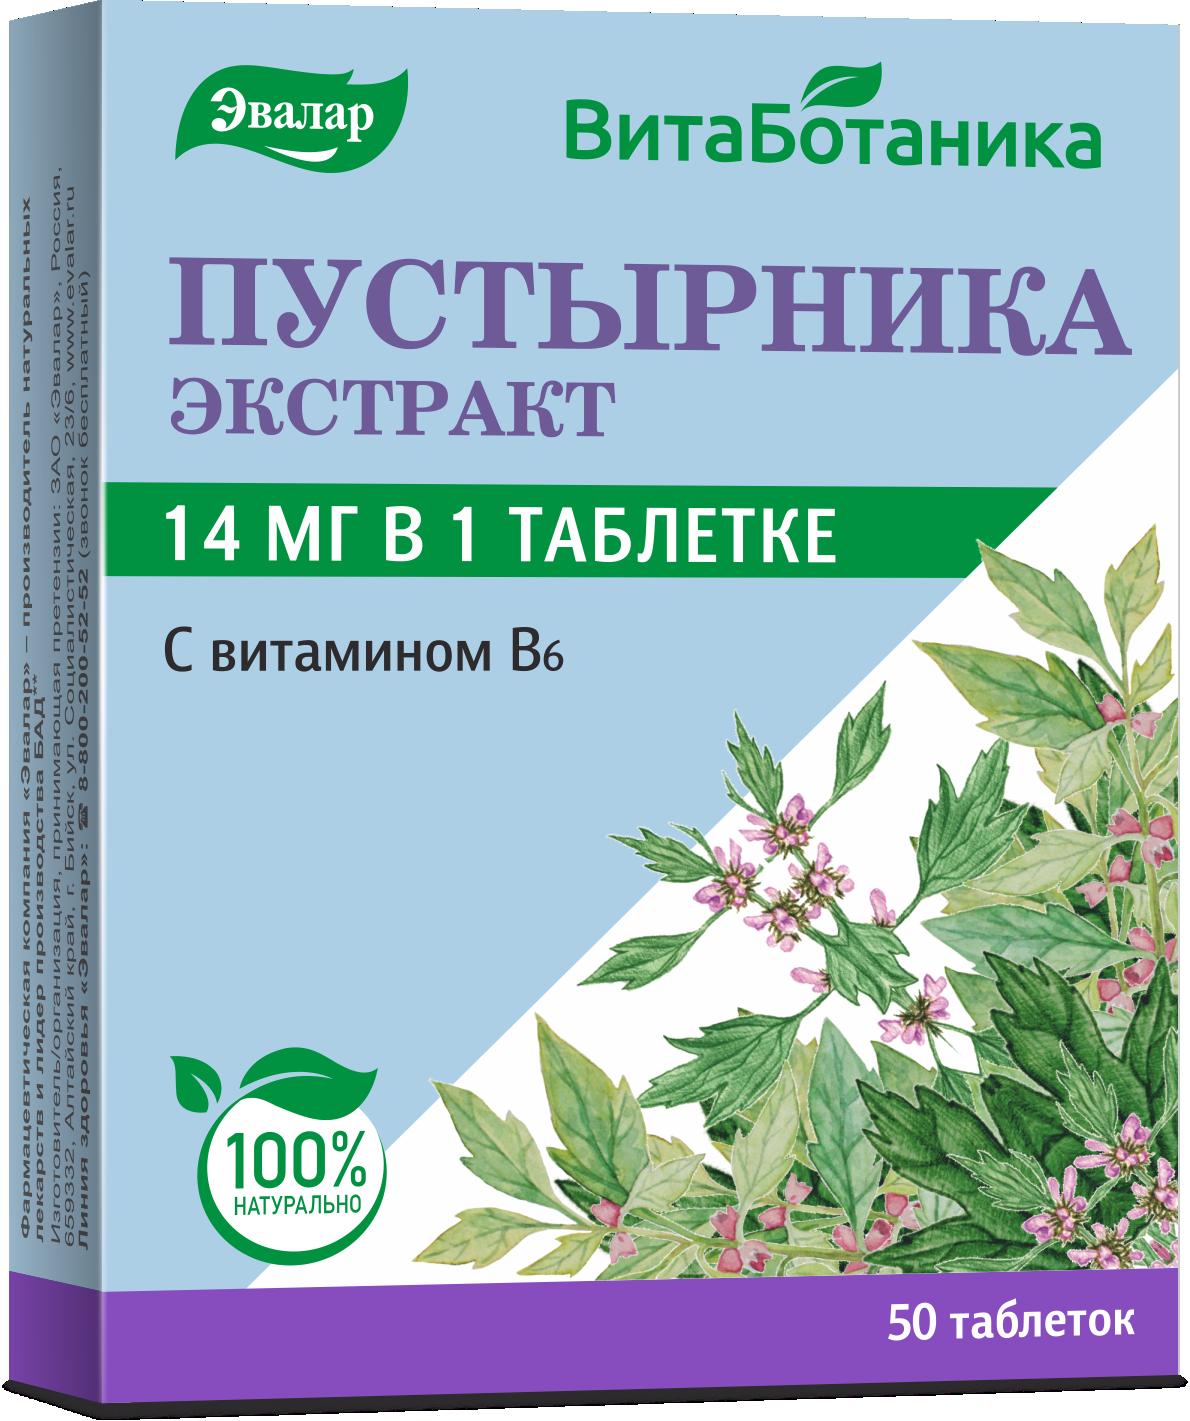 Пустырника экстракт, 14 мг, 50 таблеток, Эвалар